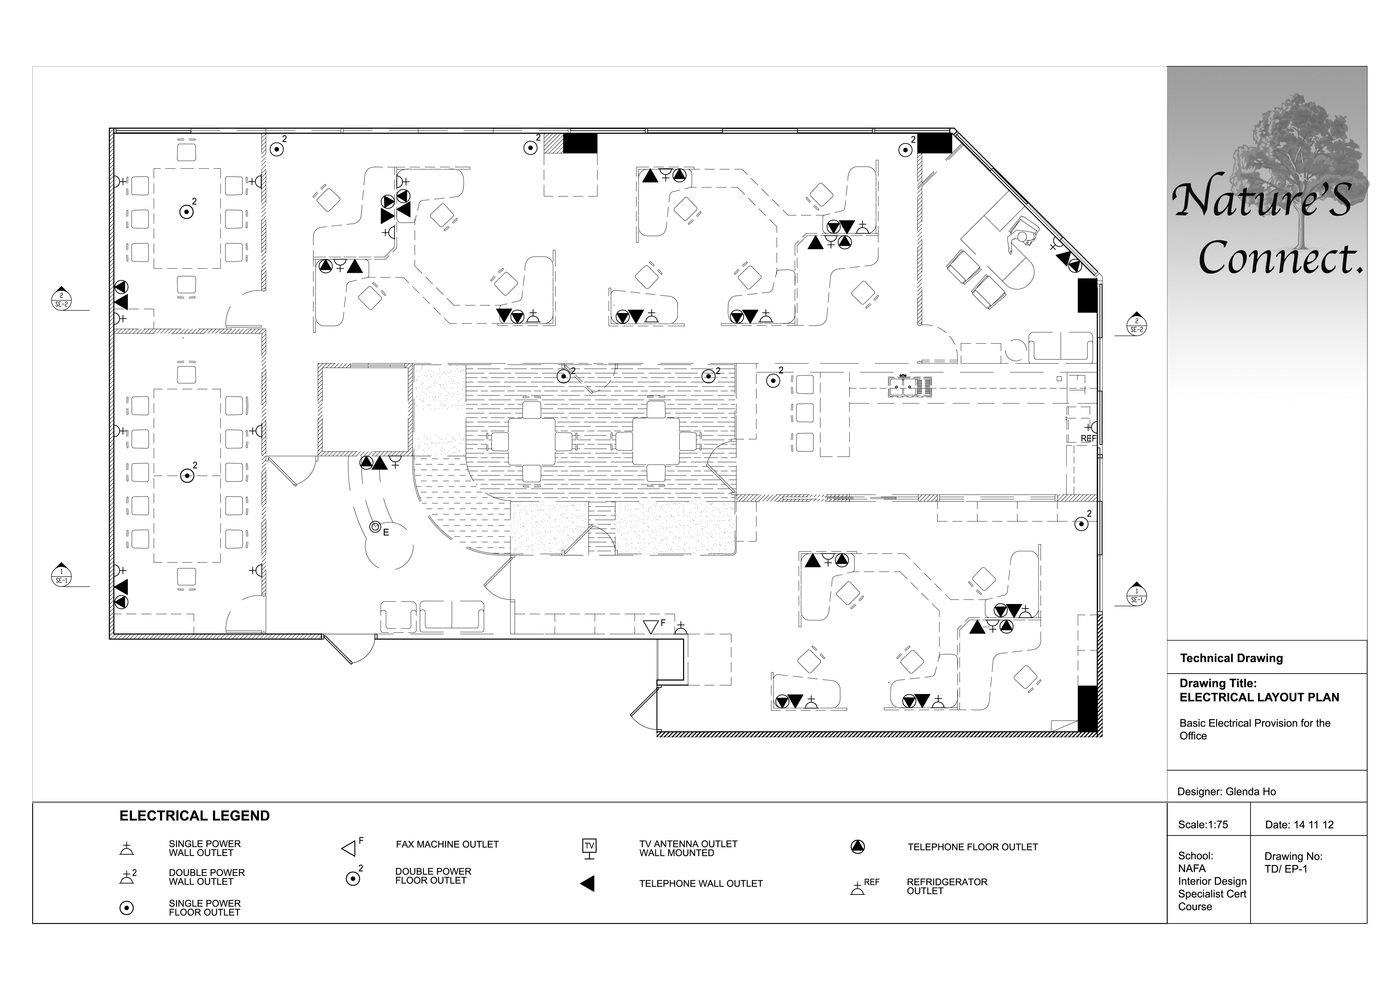 nature 39 s connect office design by glenda ho at. Black Bedroom Furniture Sets. Home Design Ideas